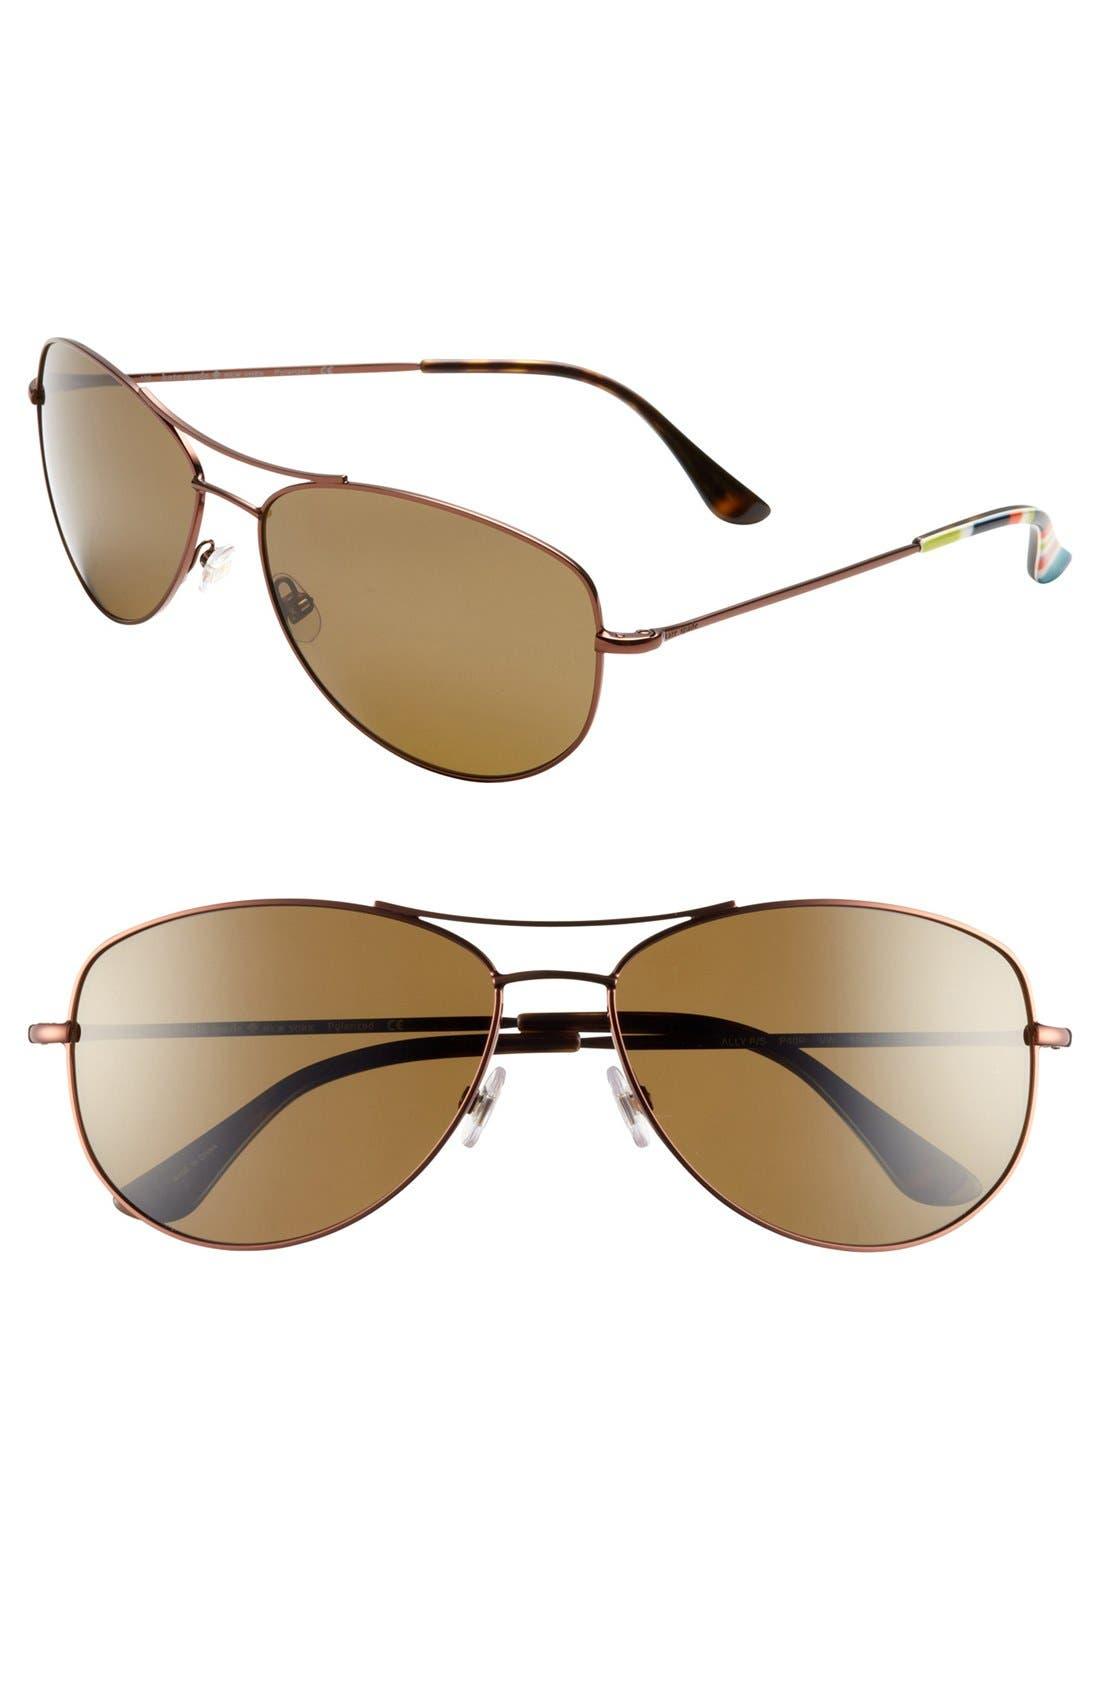 Main Image - kate spade new york 'ally' 60mm polarized metal aviator sunglasses